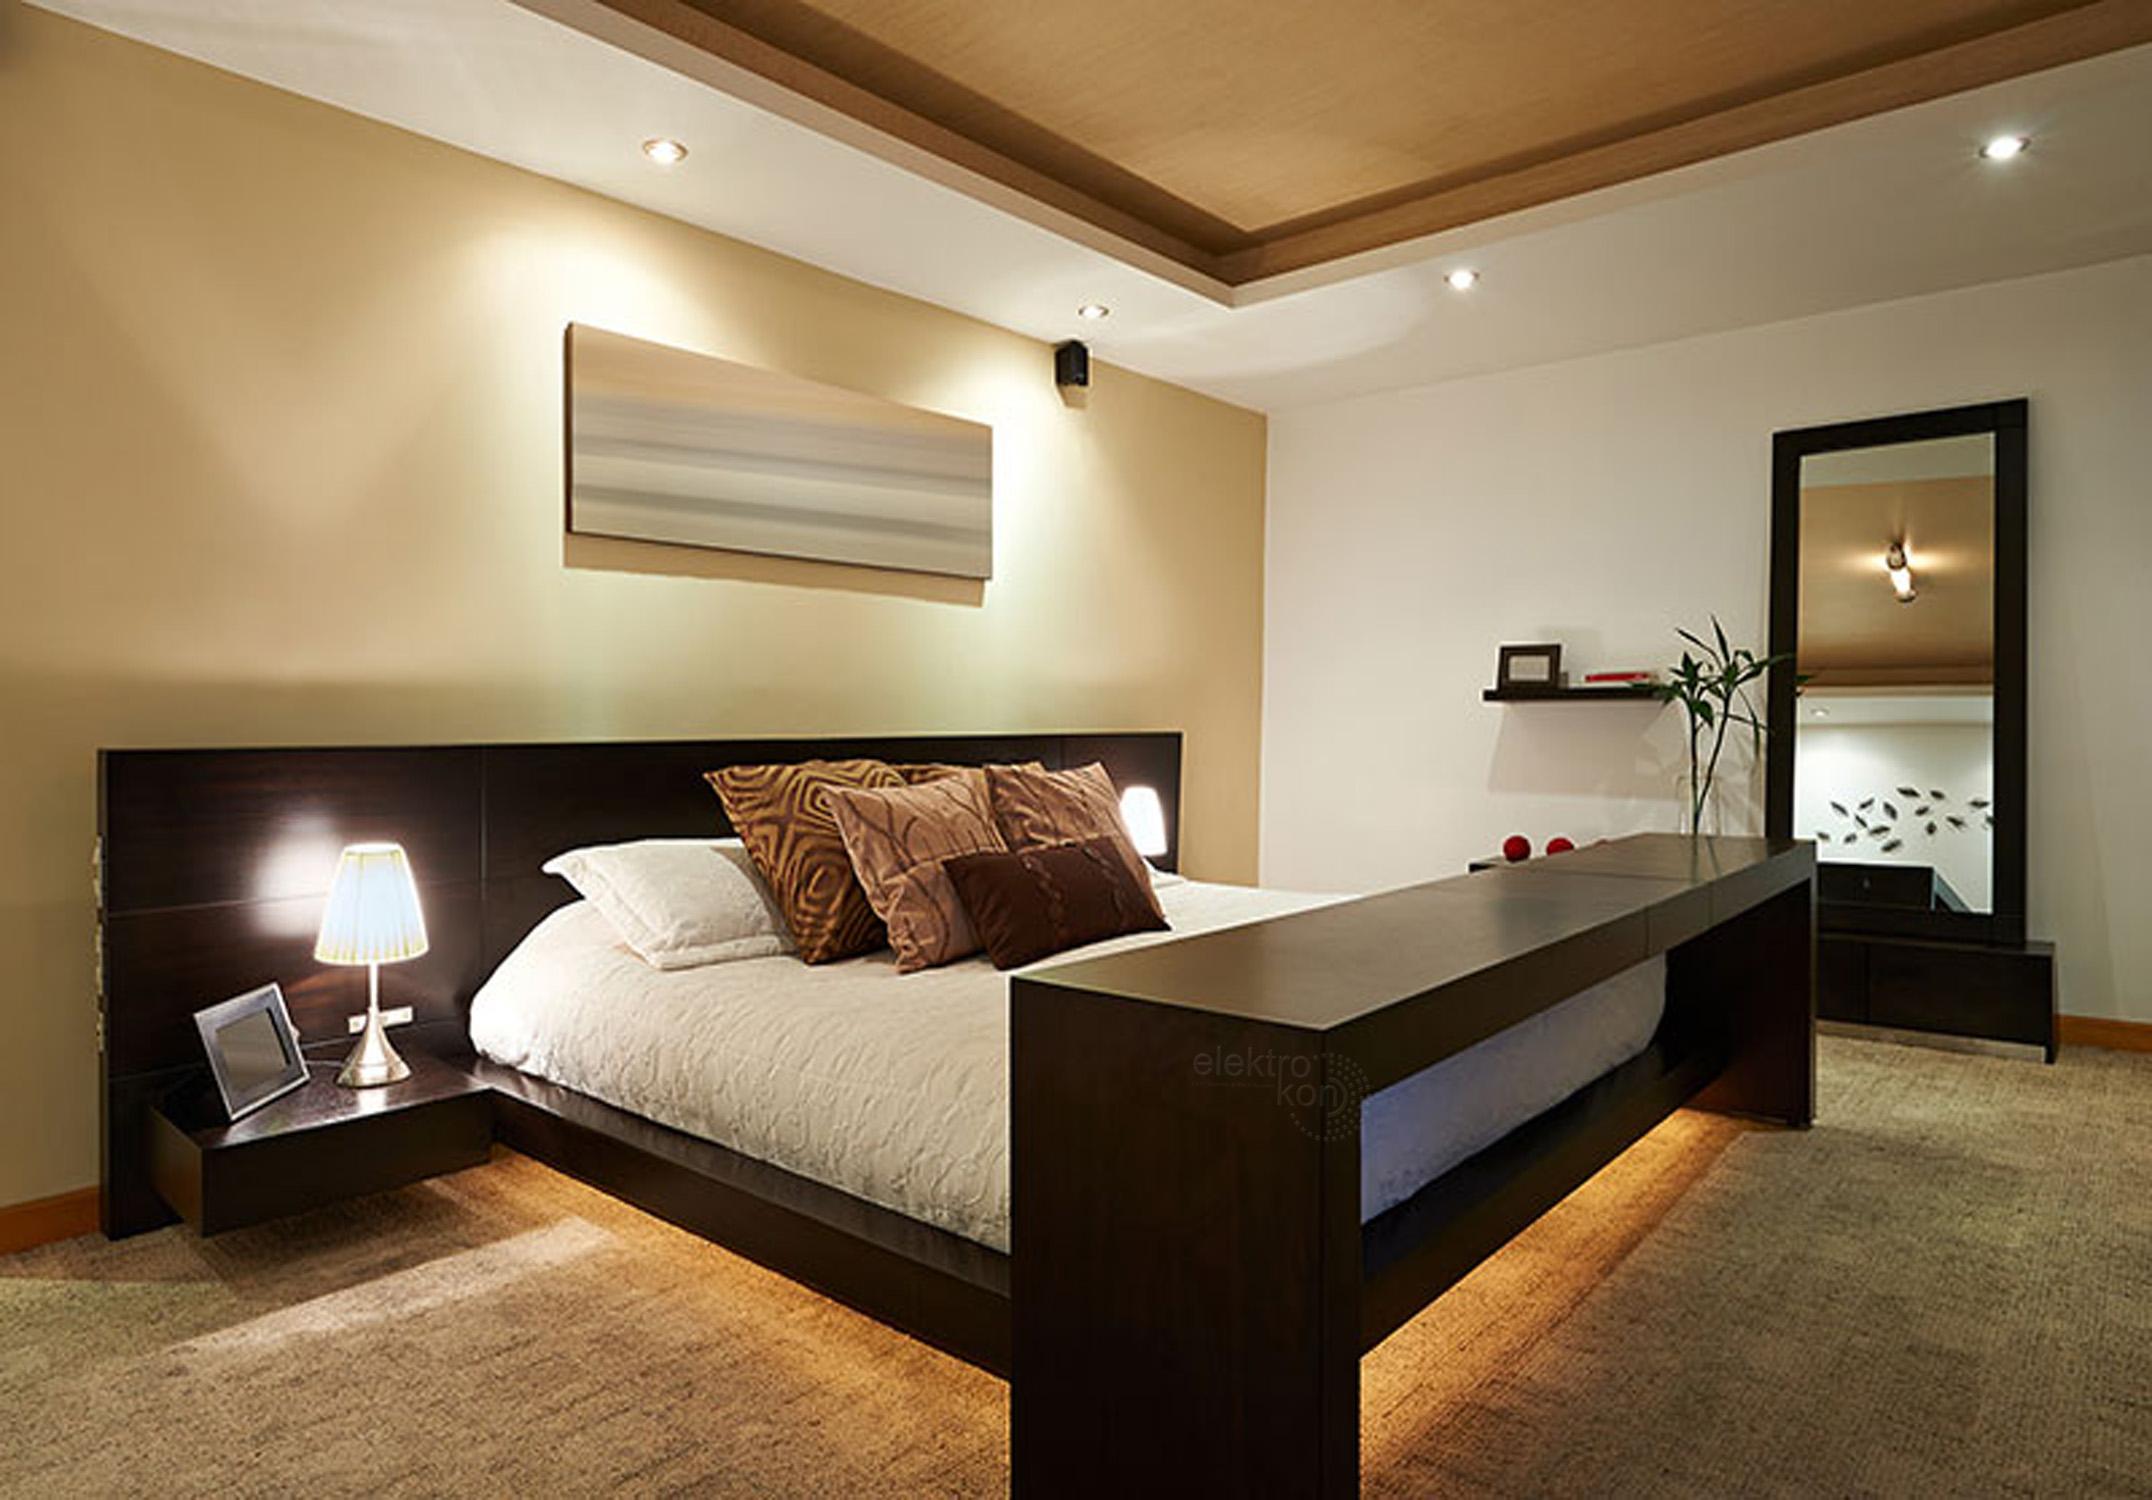 einbau rahmen deckenstrahler led gu10 gu5 3 mr16 schwenkbar edelstahl eckig ebay. Black Bedroom Furniture Sets. Home Design Ideas